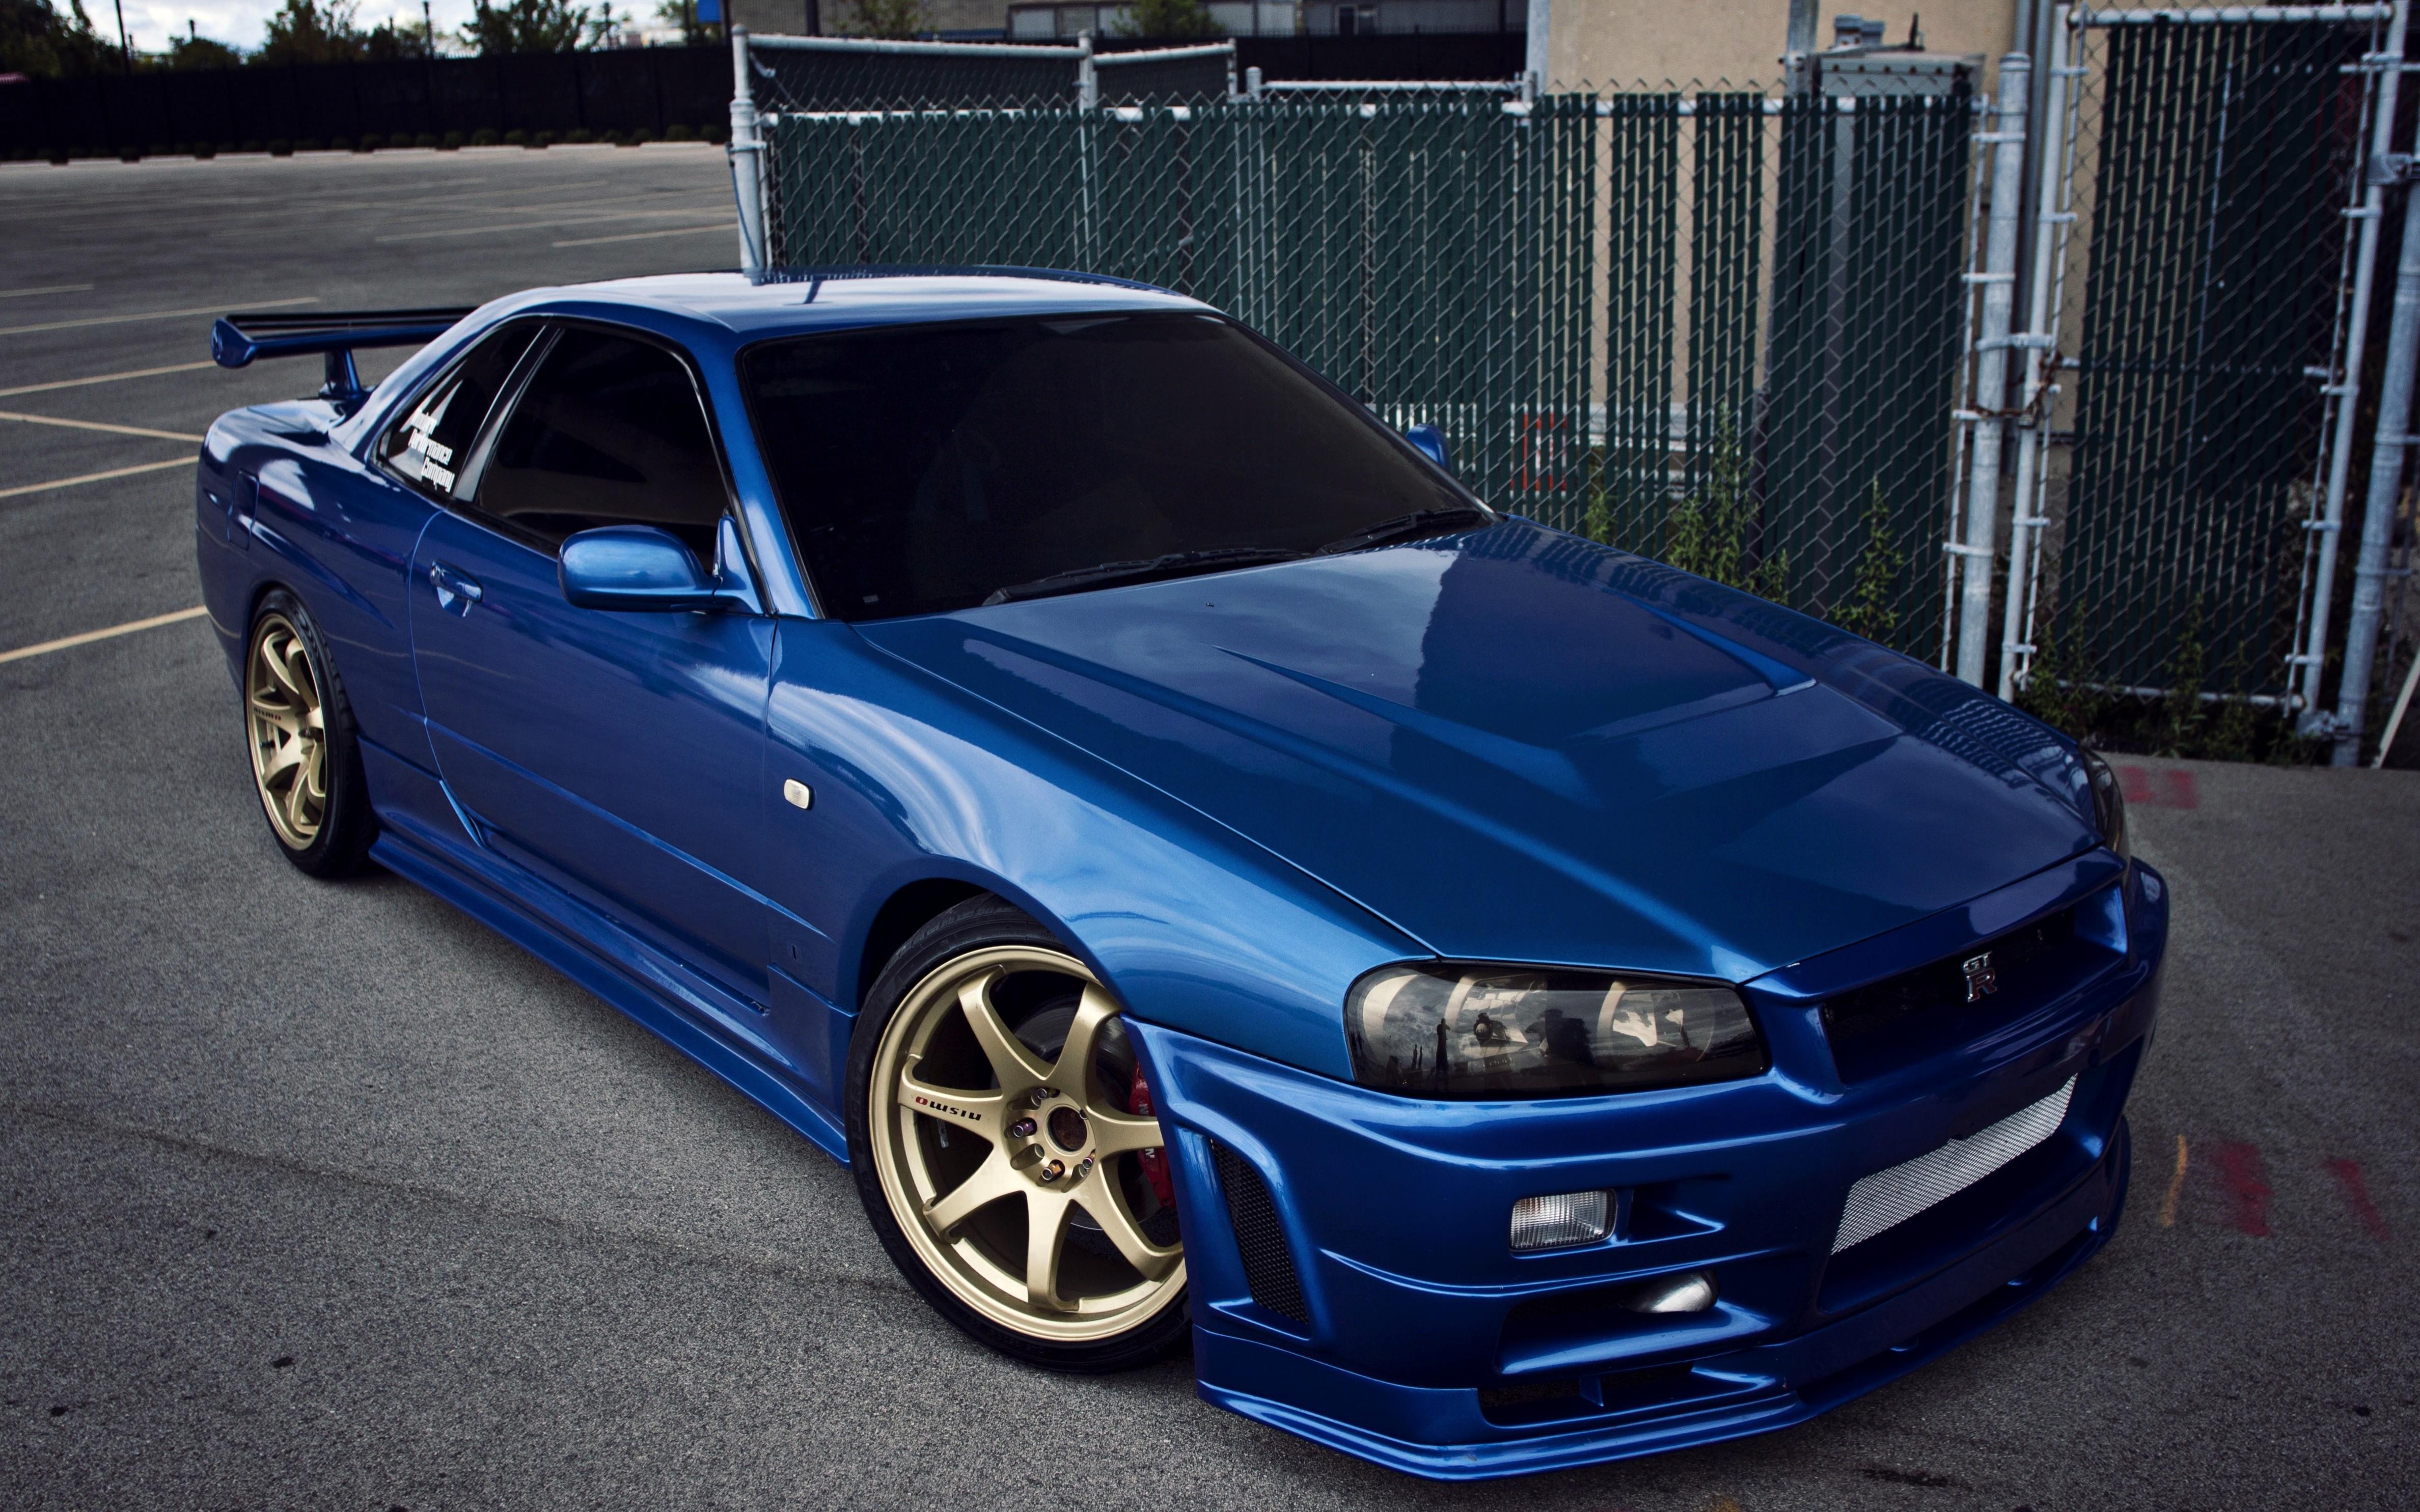 Nissan Skyline wallpapers HD quality